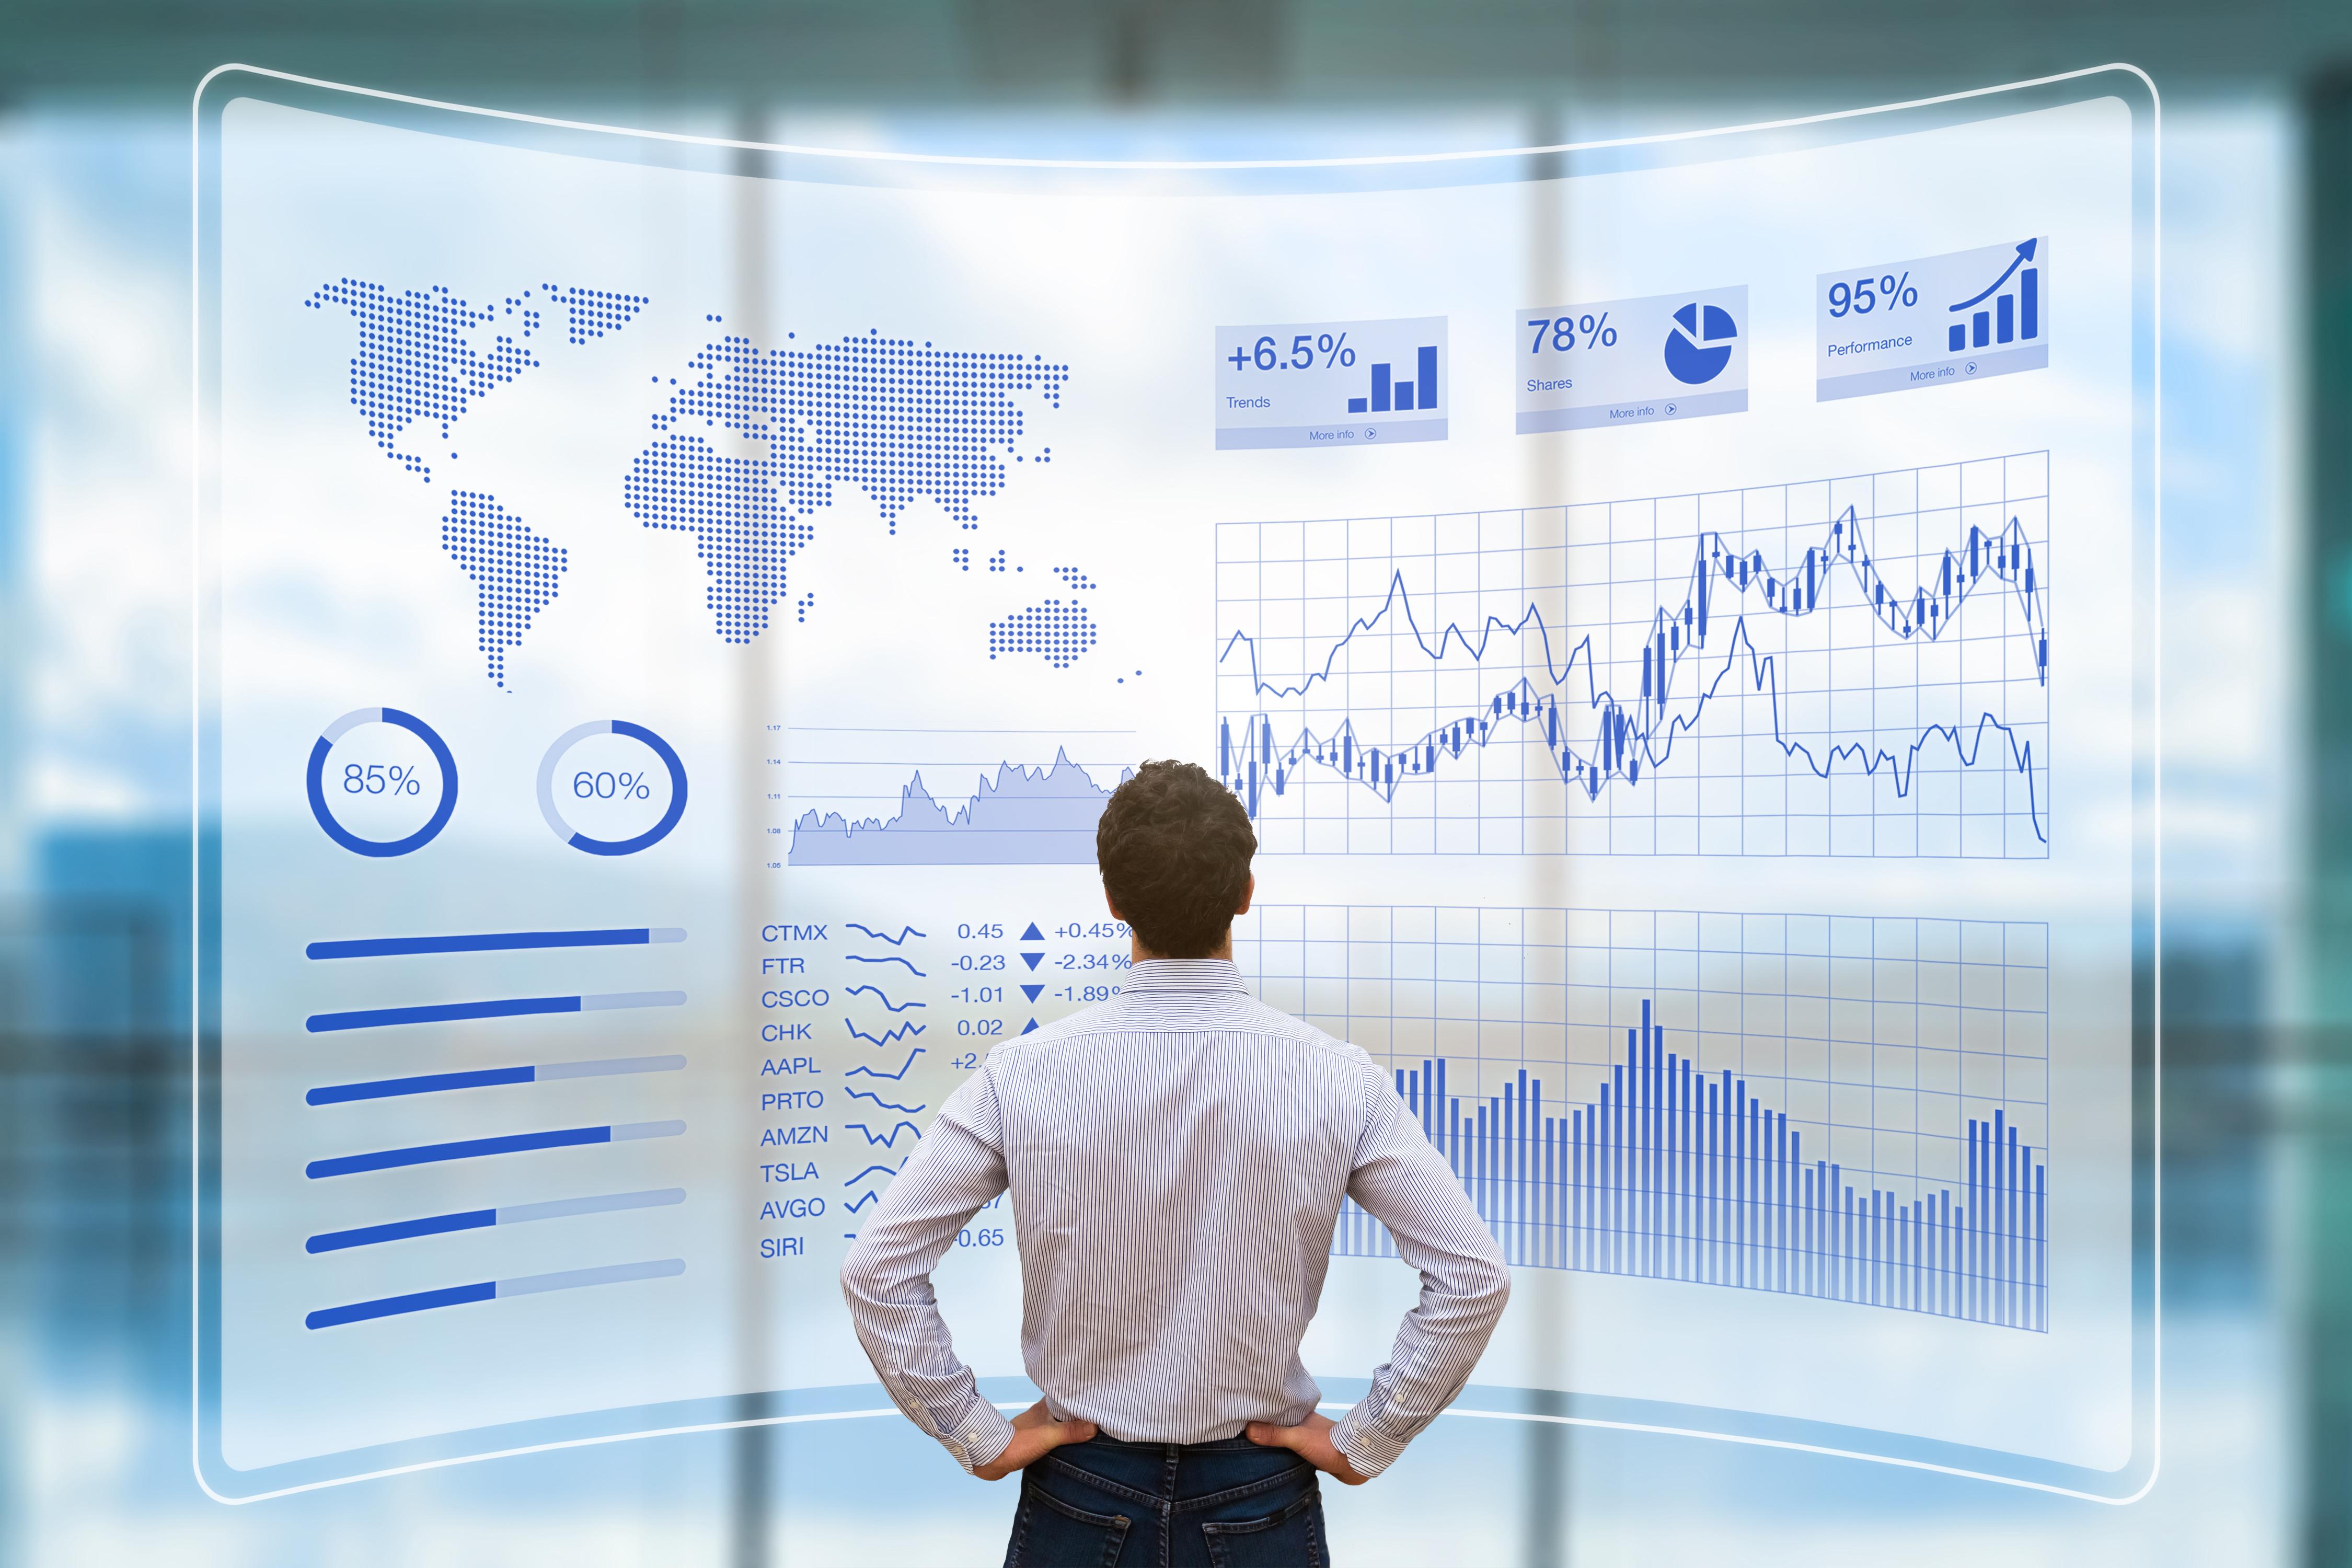 the goals of digital transformation